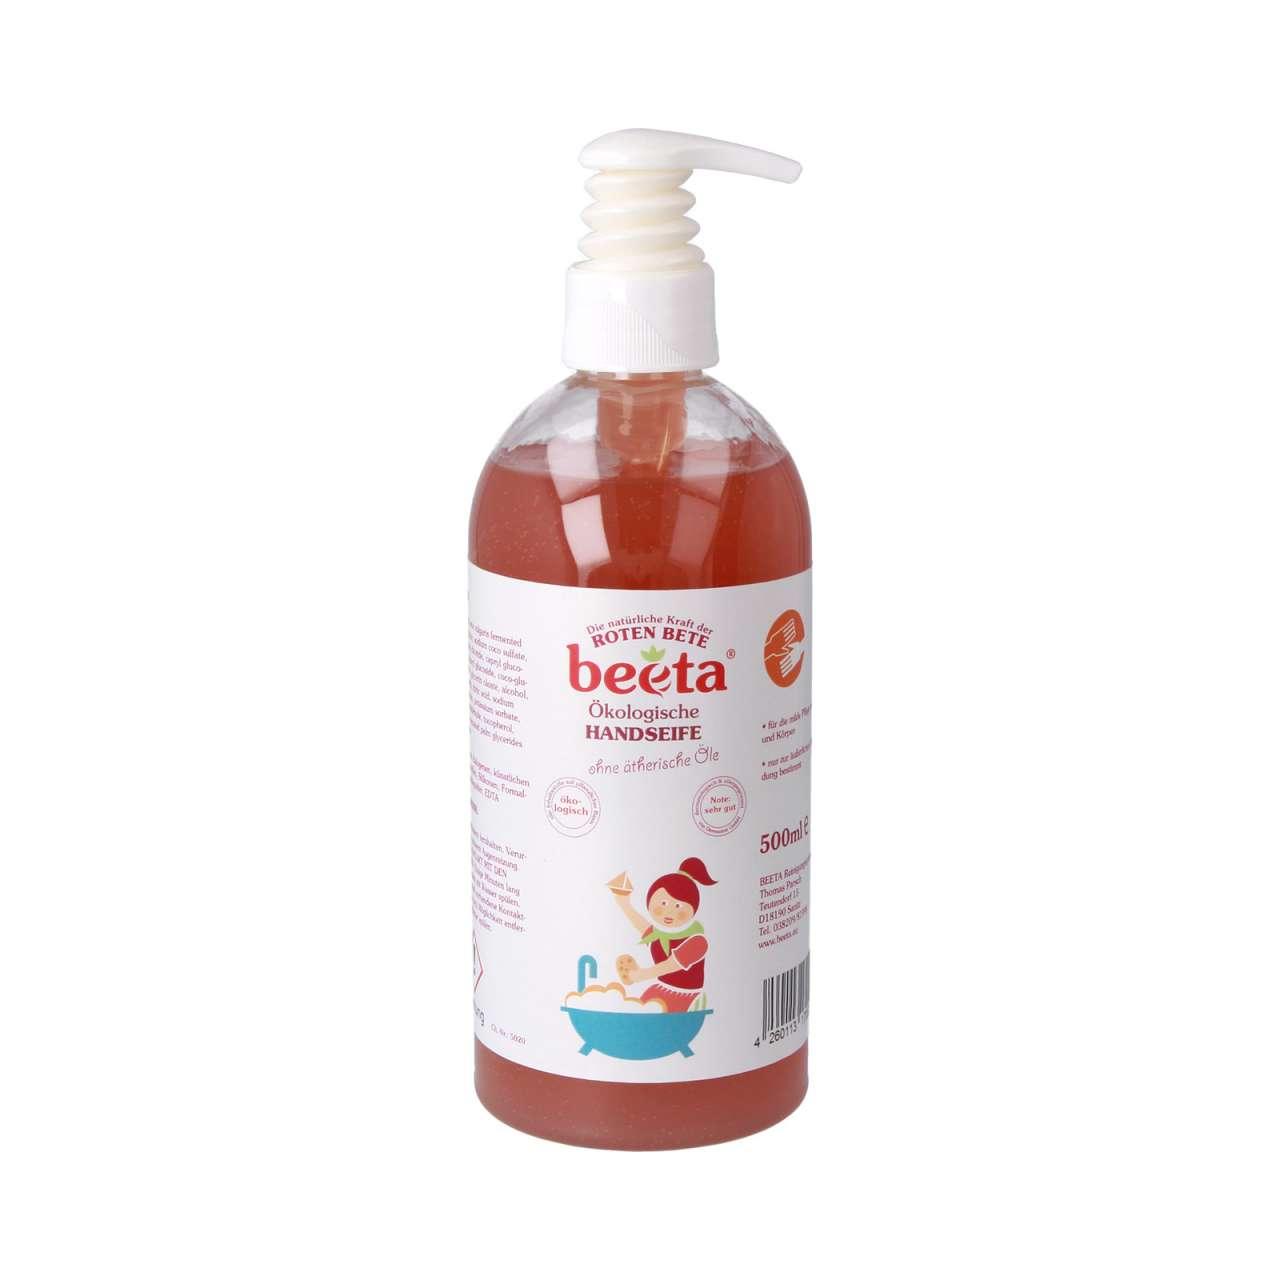 Beeta Handseife ohne Duftstoffe, biologisch abbaubare Seife